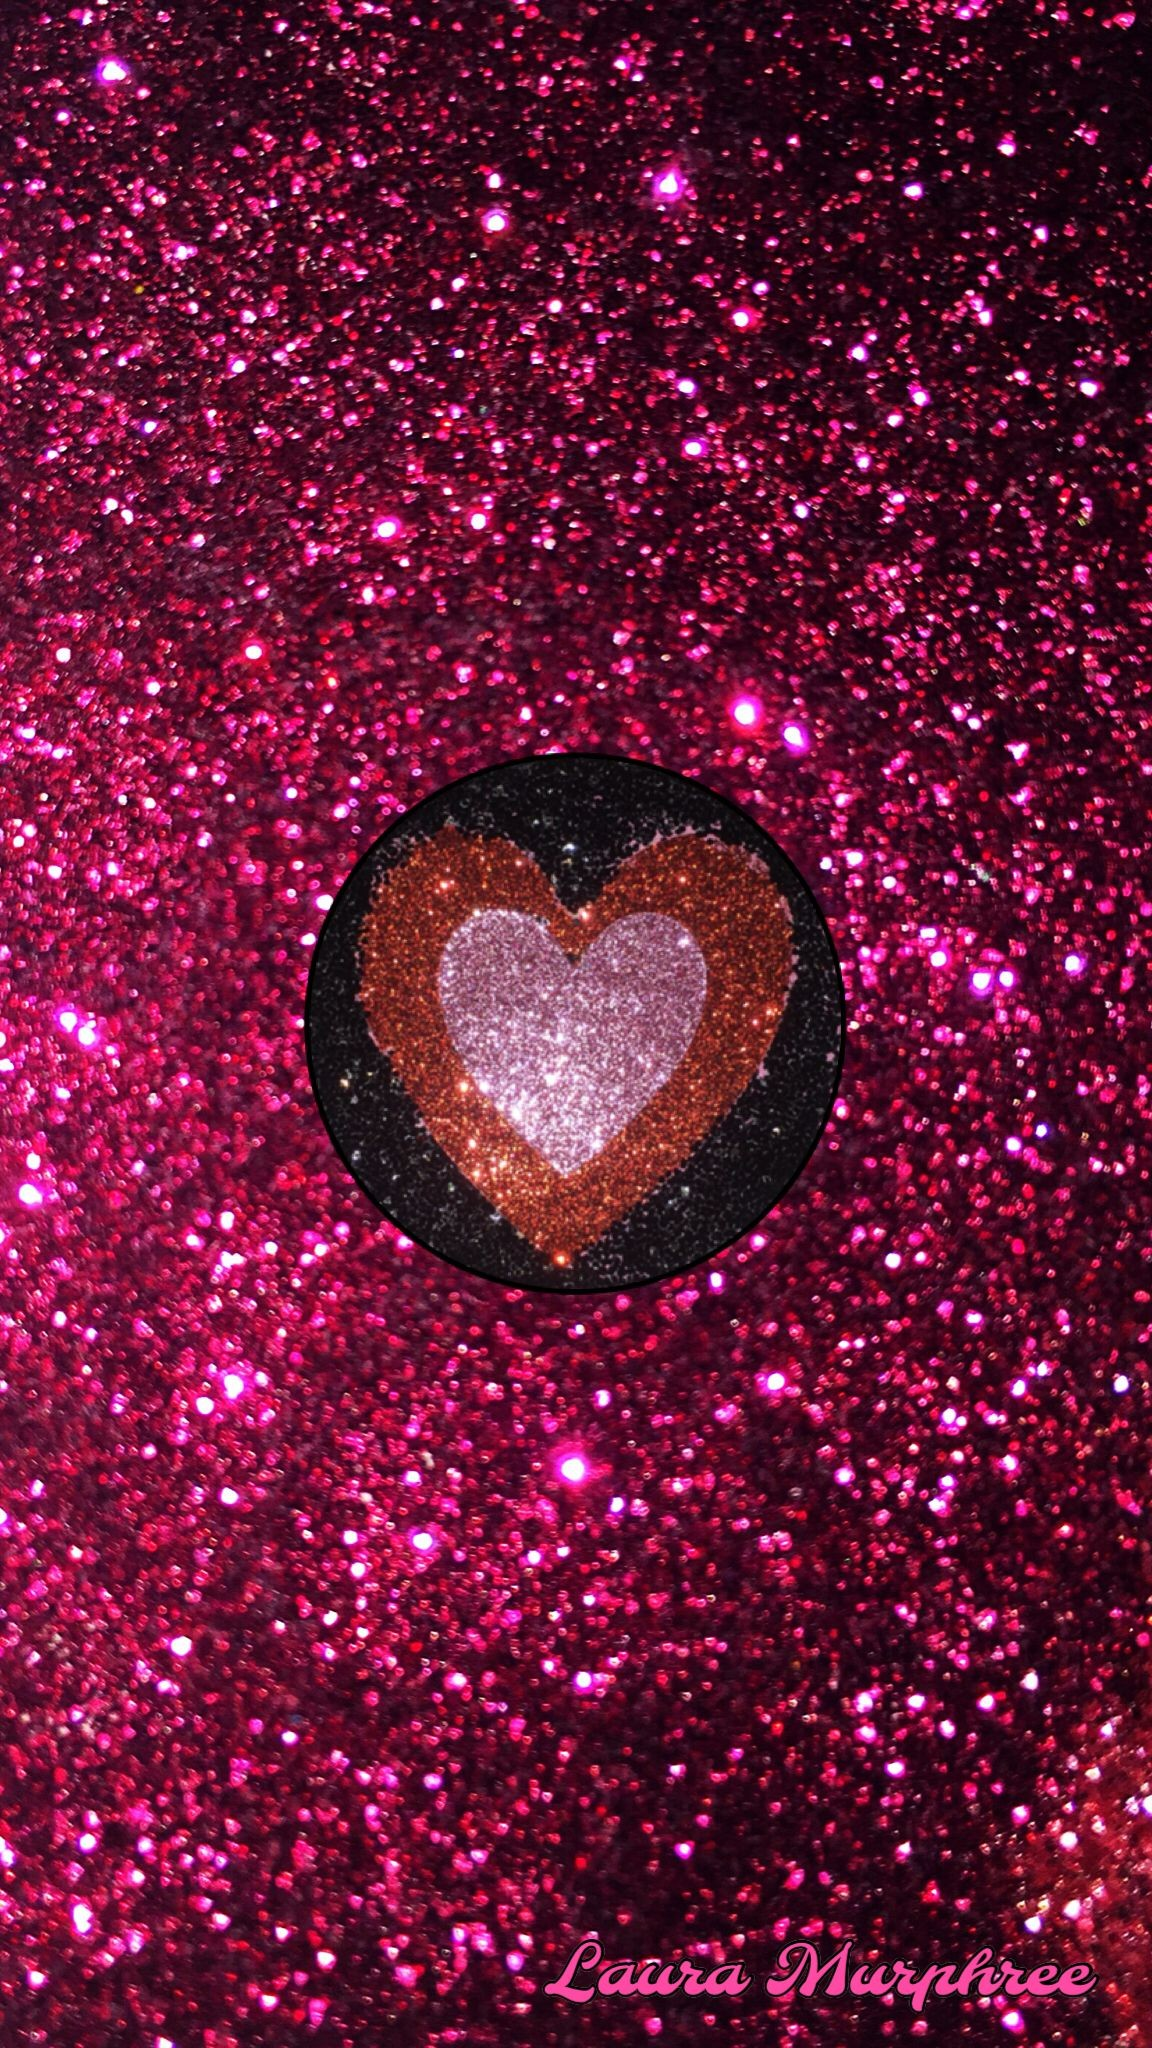 Pink Glitter Phone Wallpaper 76+ images